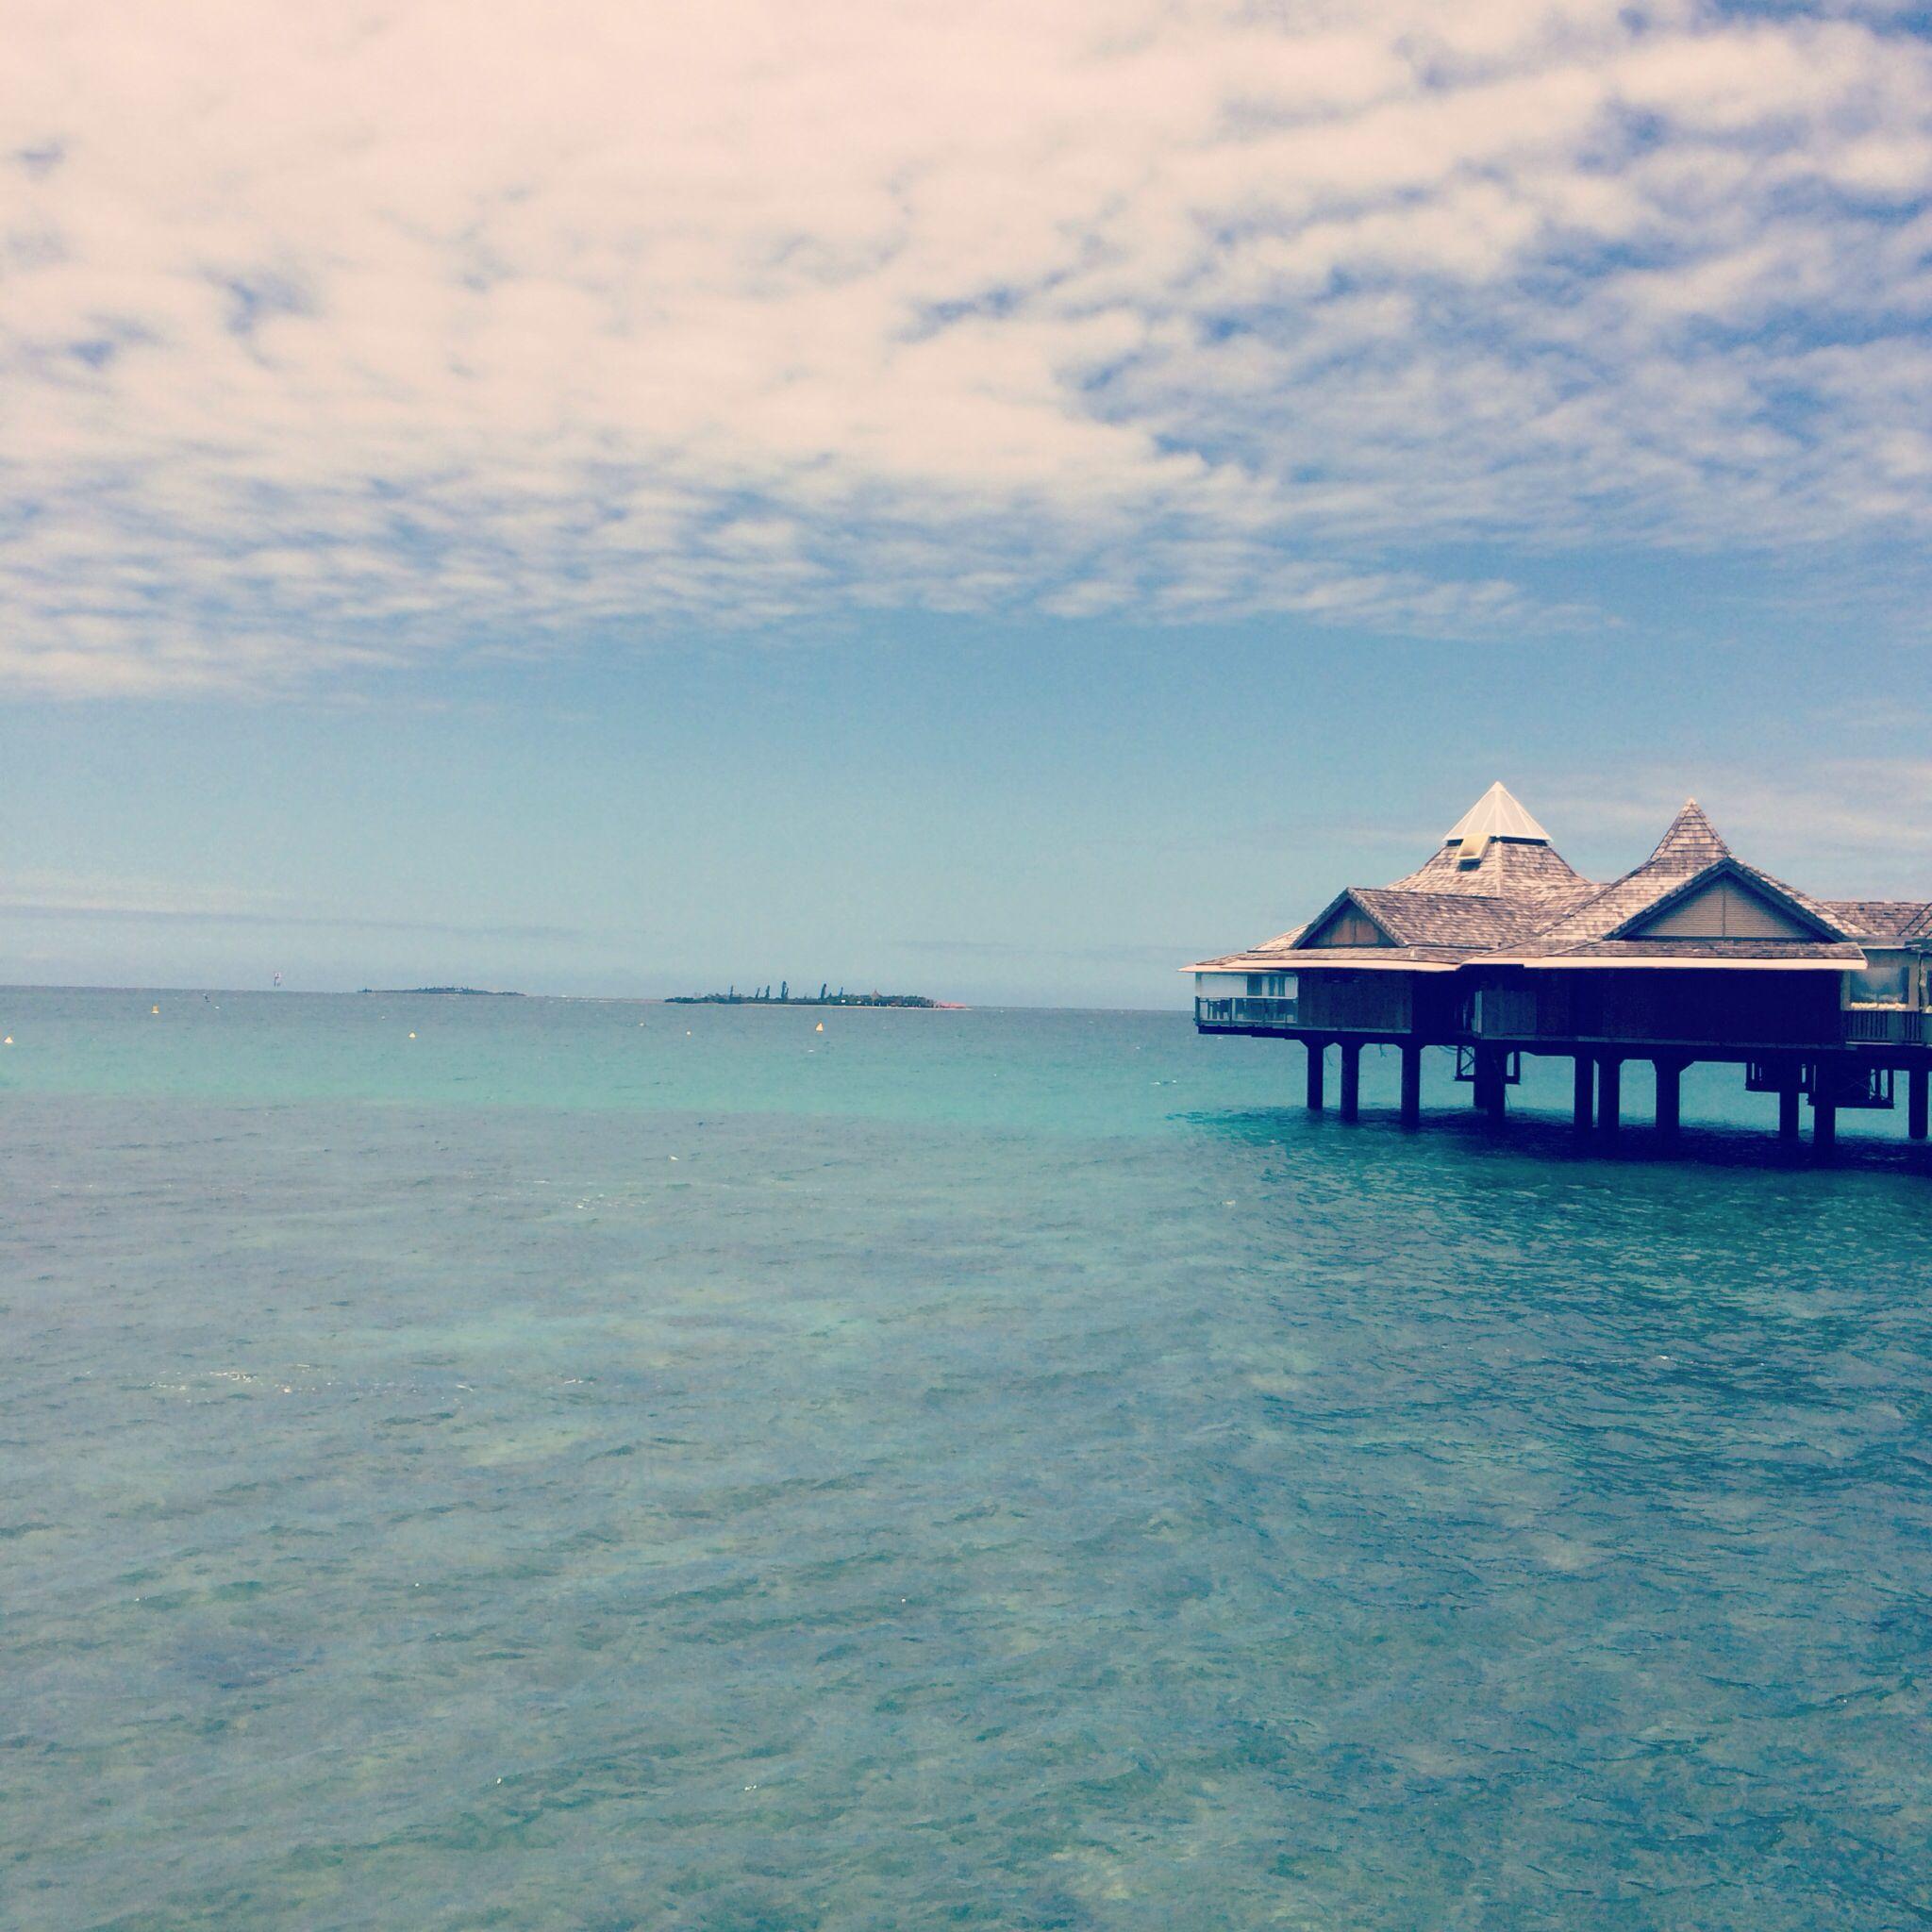 Nomea, New Caledonia